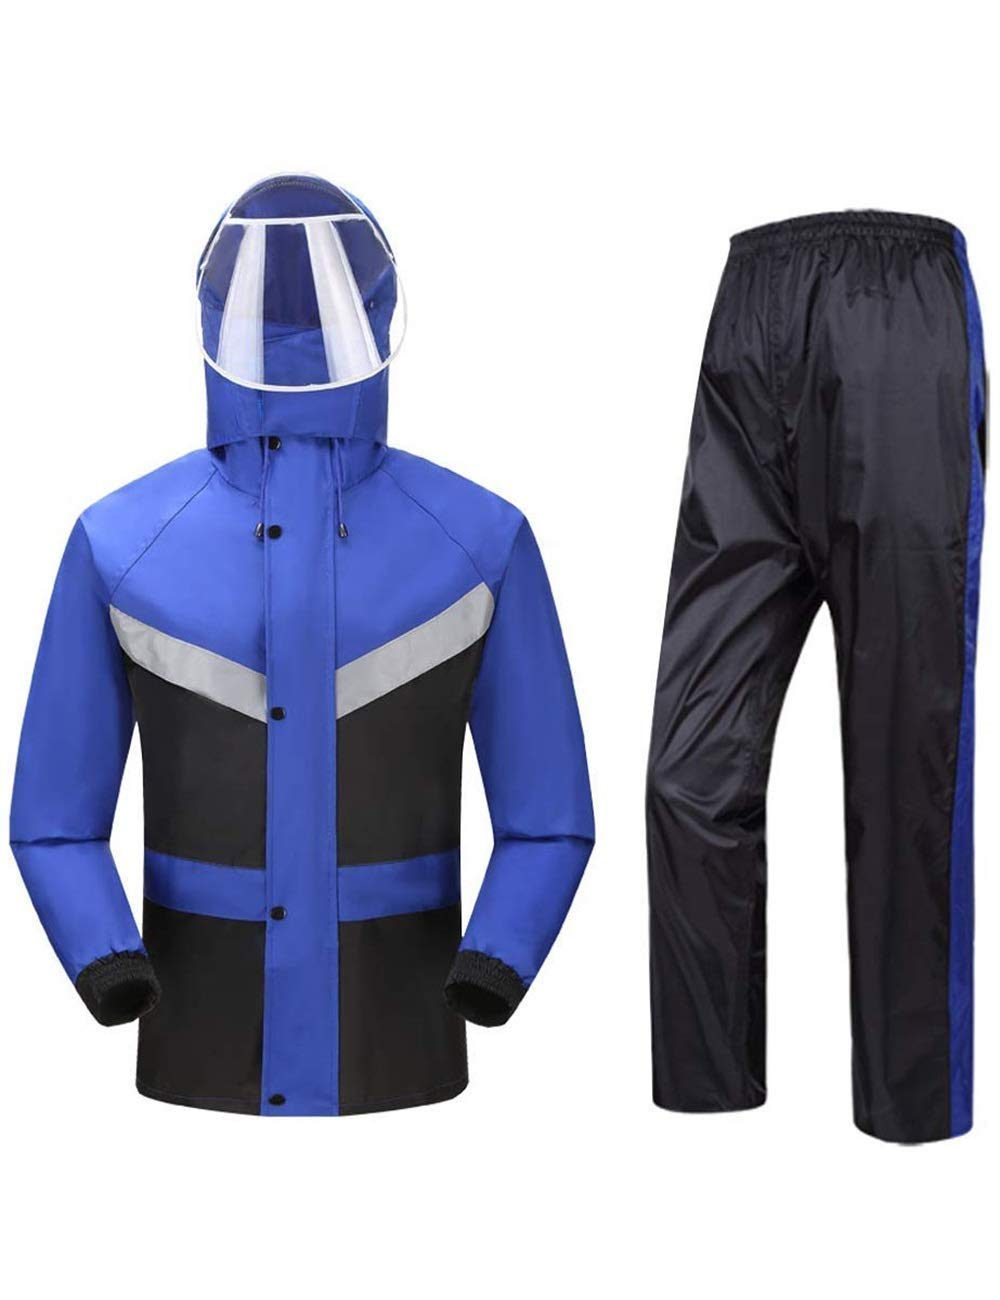 Waterproof Jacket Trouser Suit Breathable Hooded Raincoat Men and Women Adult Outdoor Work Moto Bike bluee (Size   XLarge)